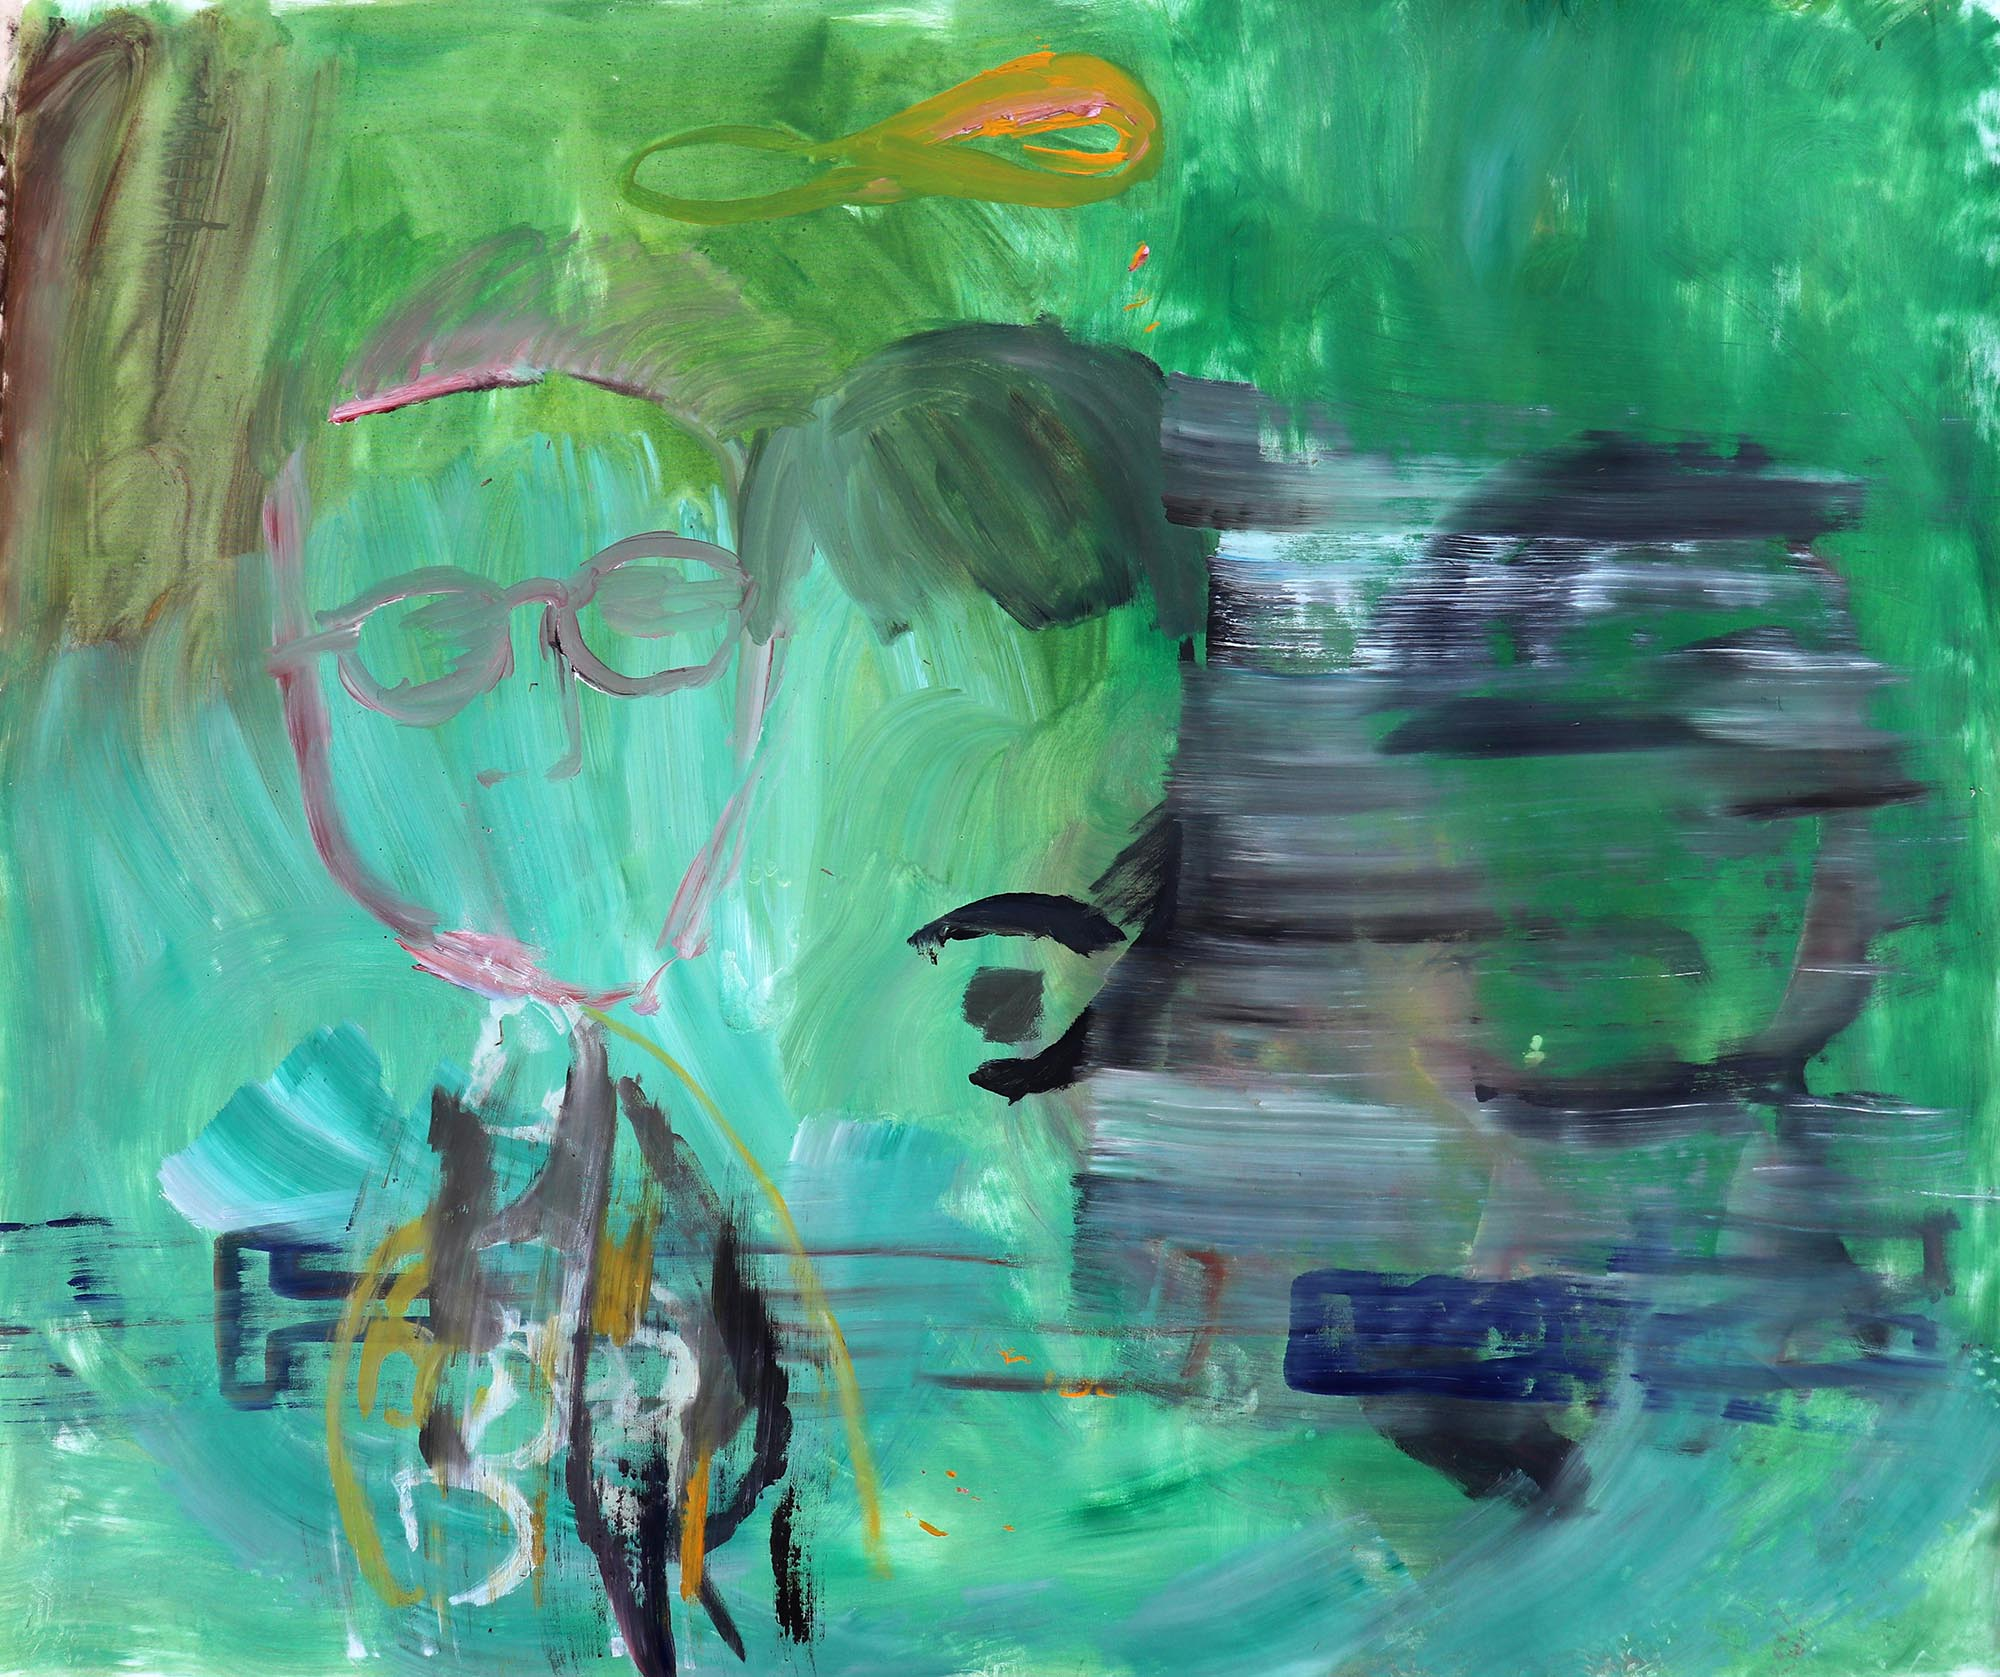 Barbora Kachlikova, Untitled 2, Acrylic on canvas, 2018